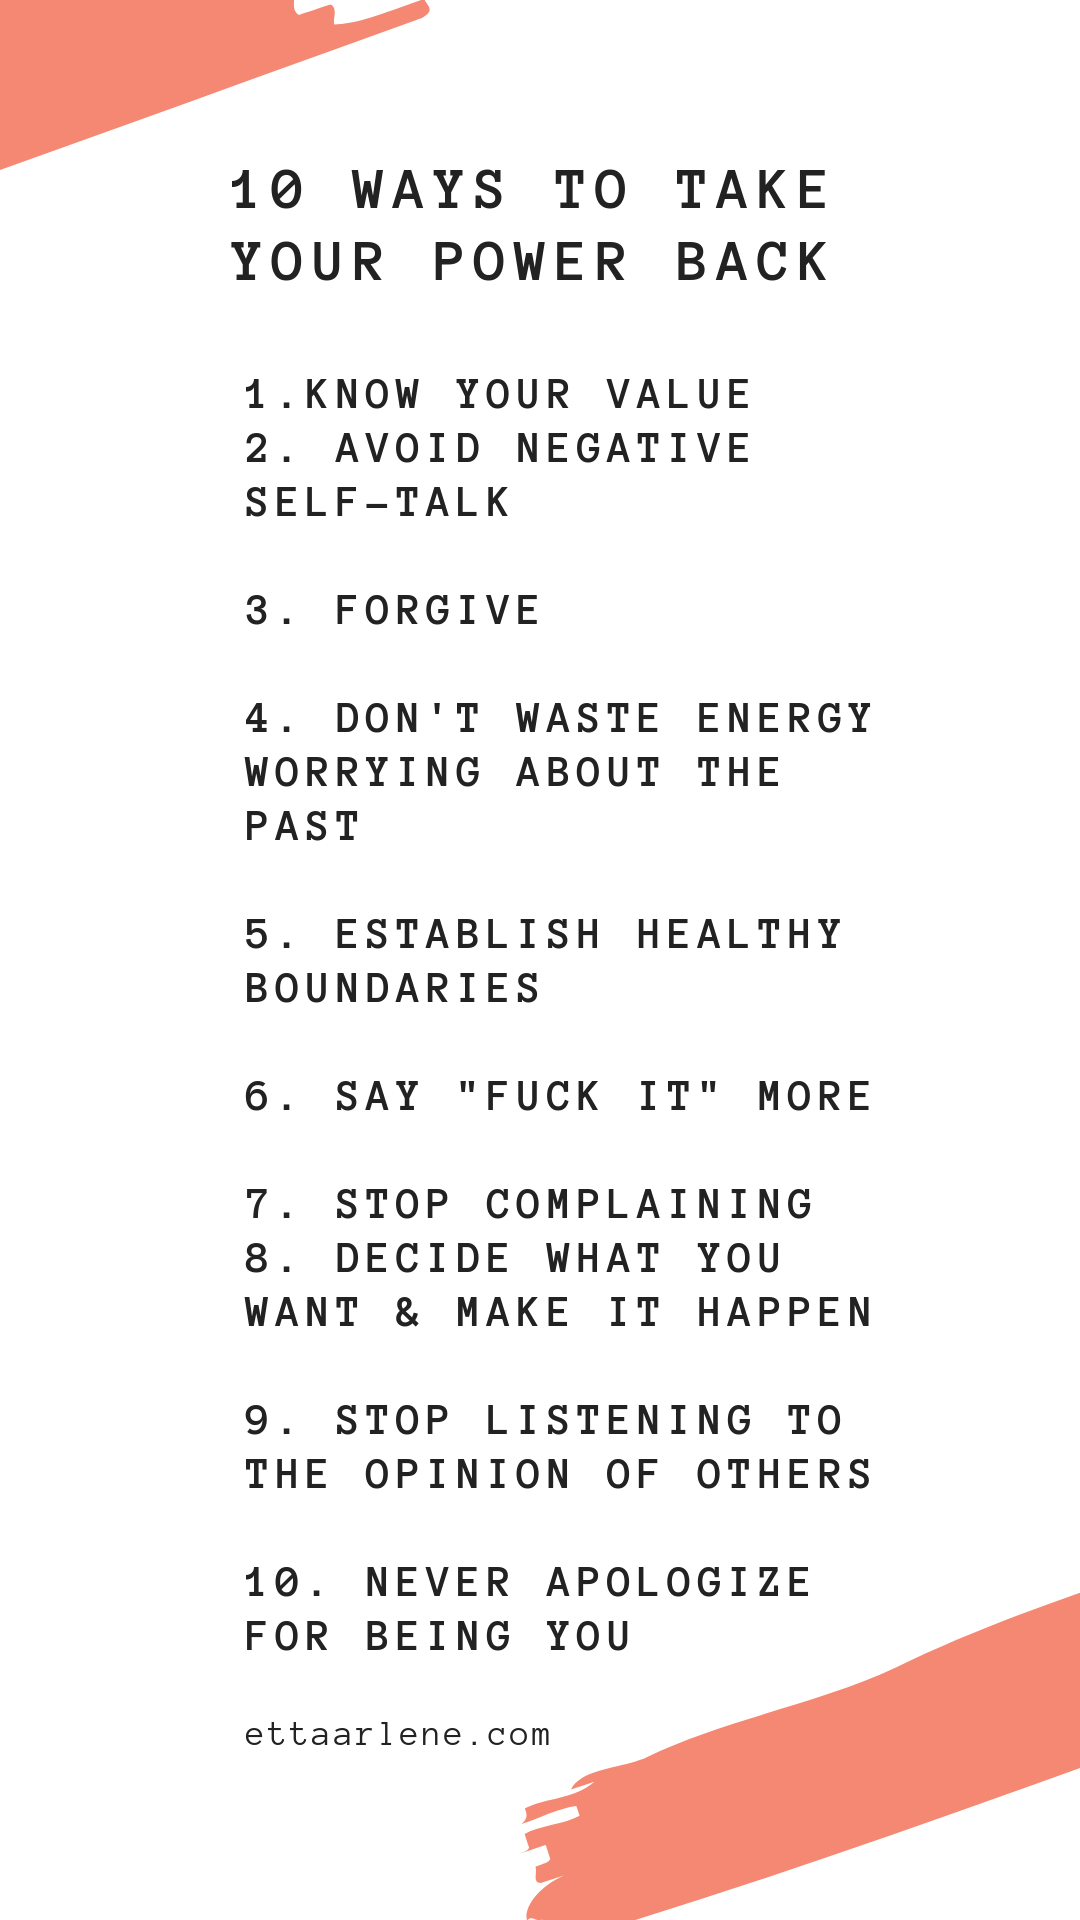 10 Ways to Take Your Power Back   ETTA ARLENE